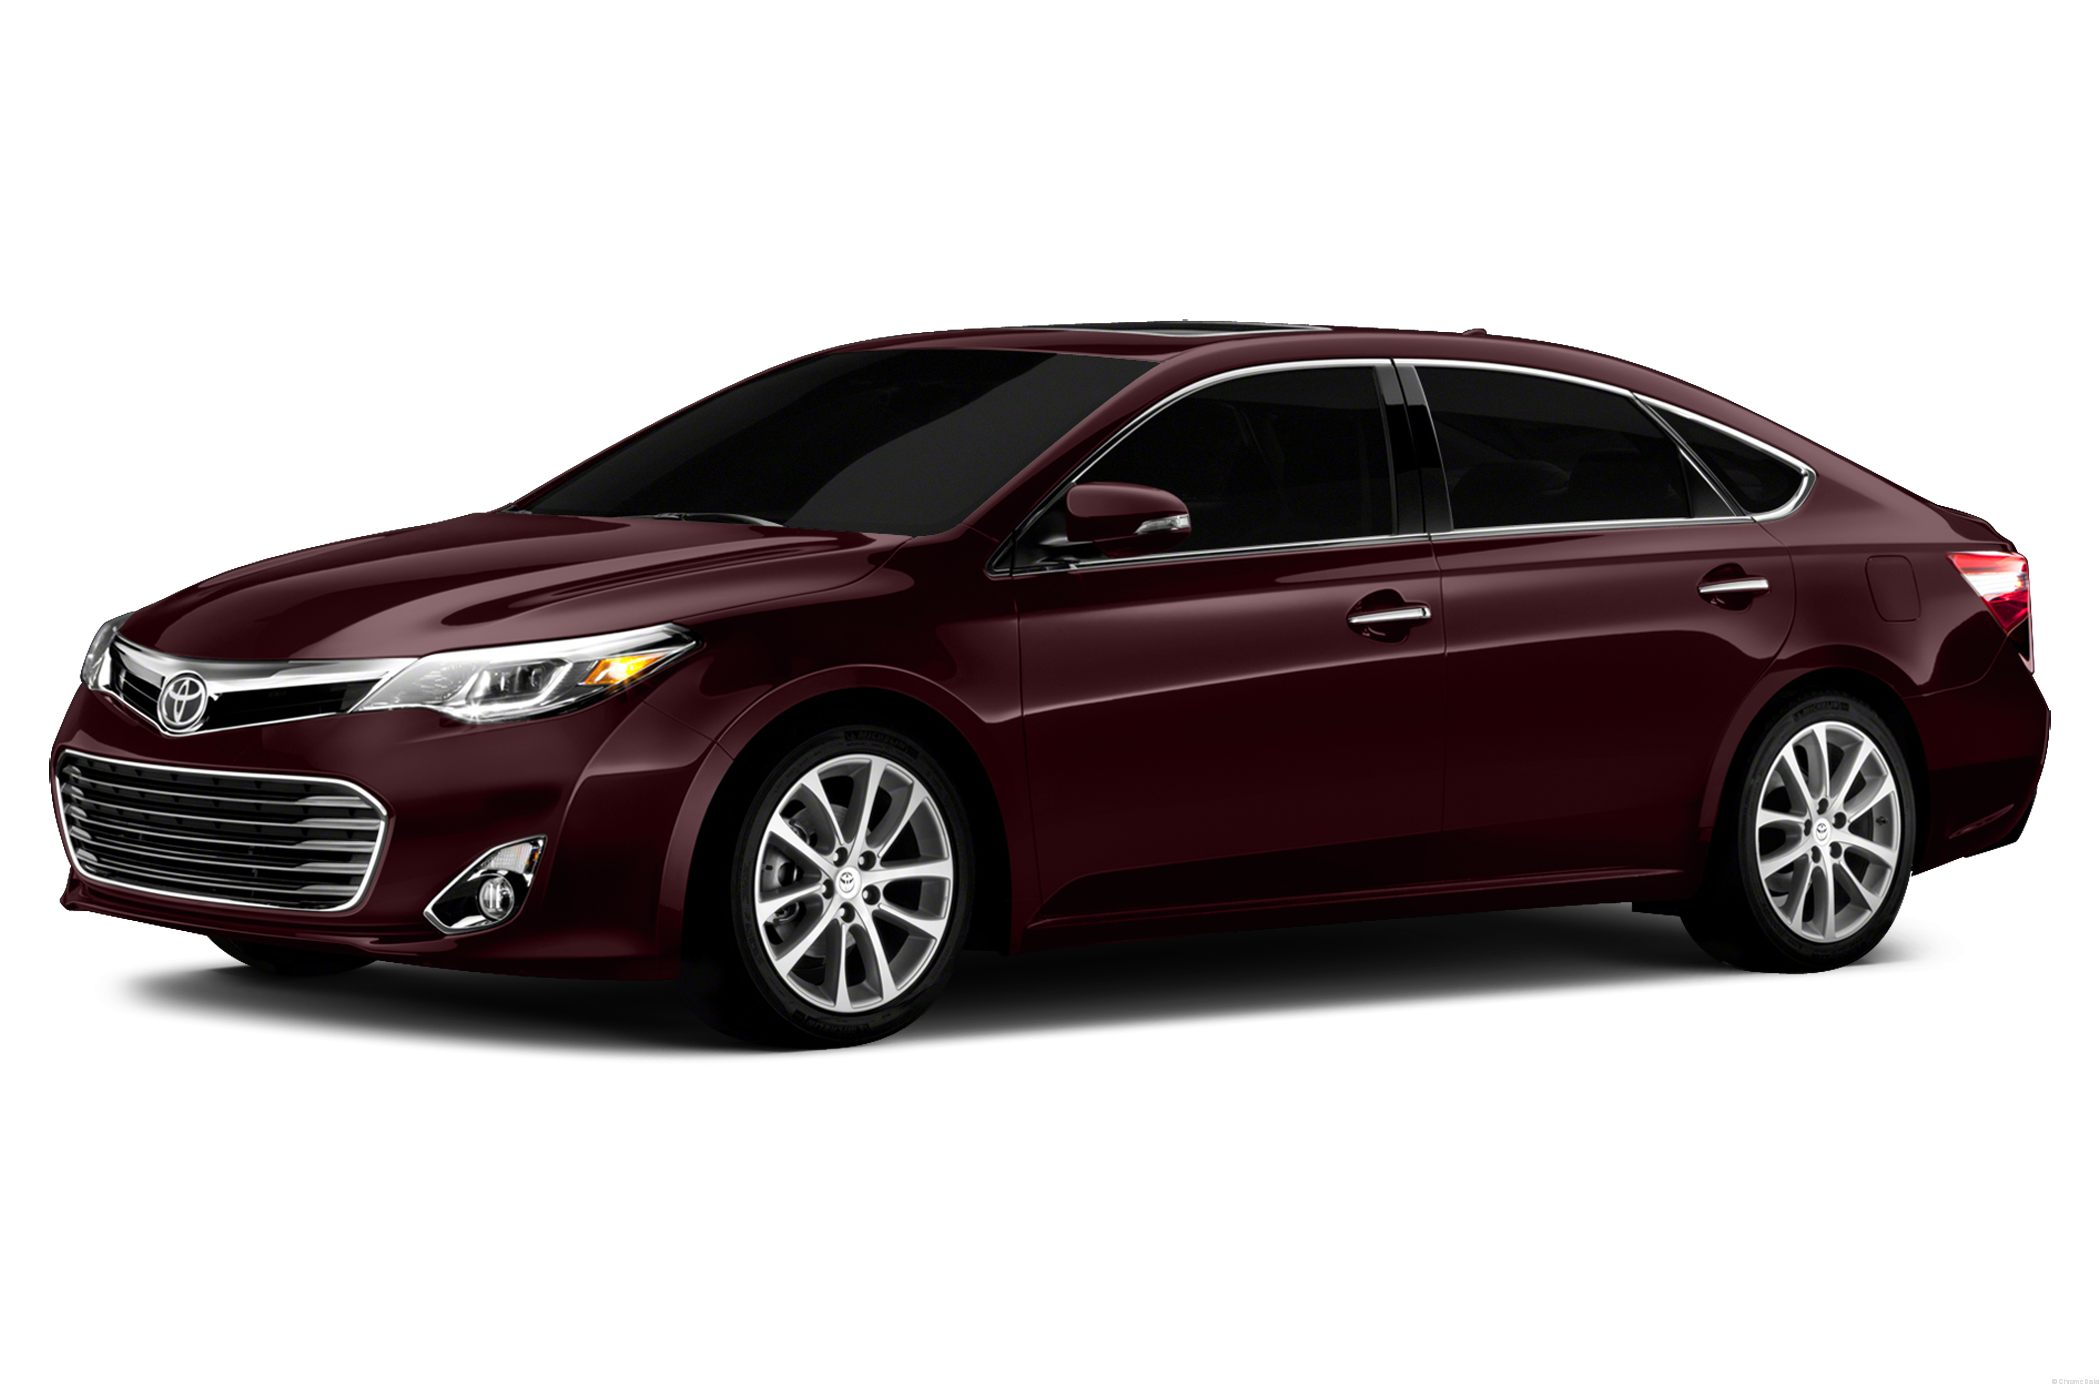 2014 Toyota Avalon  Information and photos  ZombieDrive